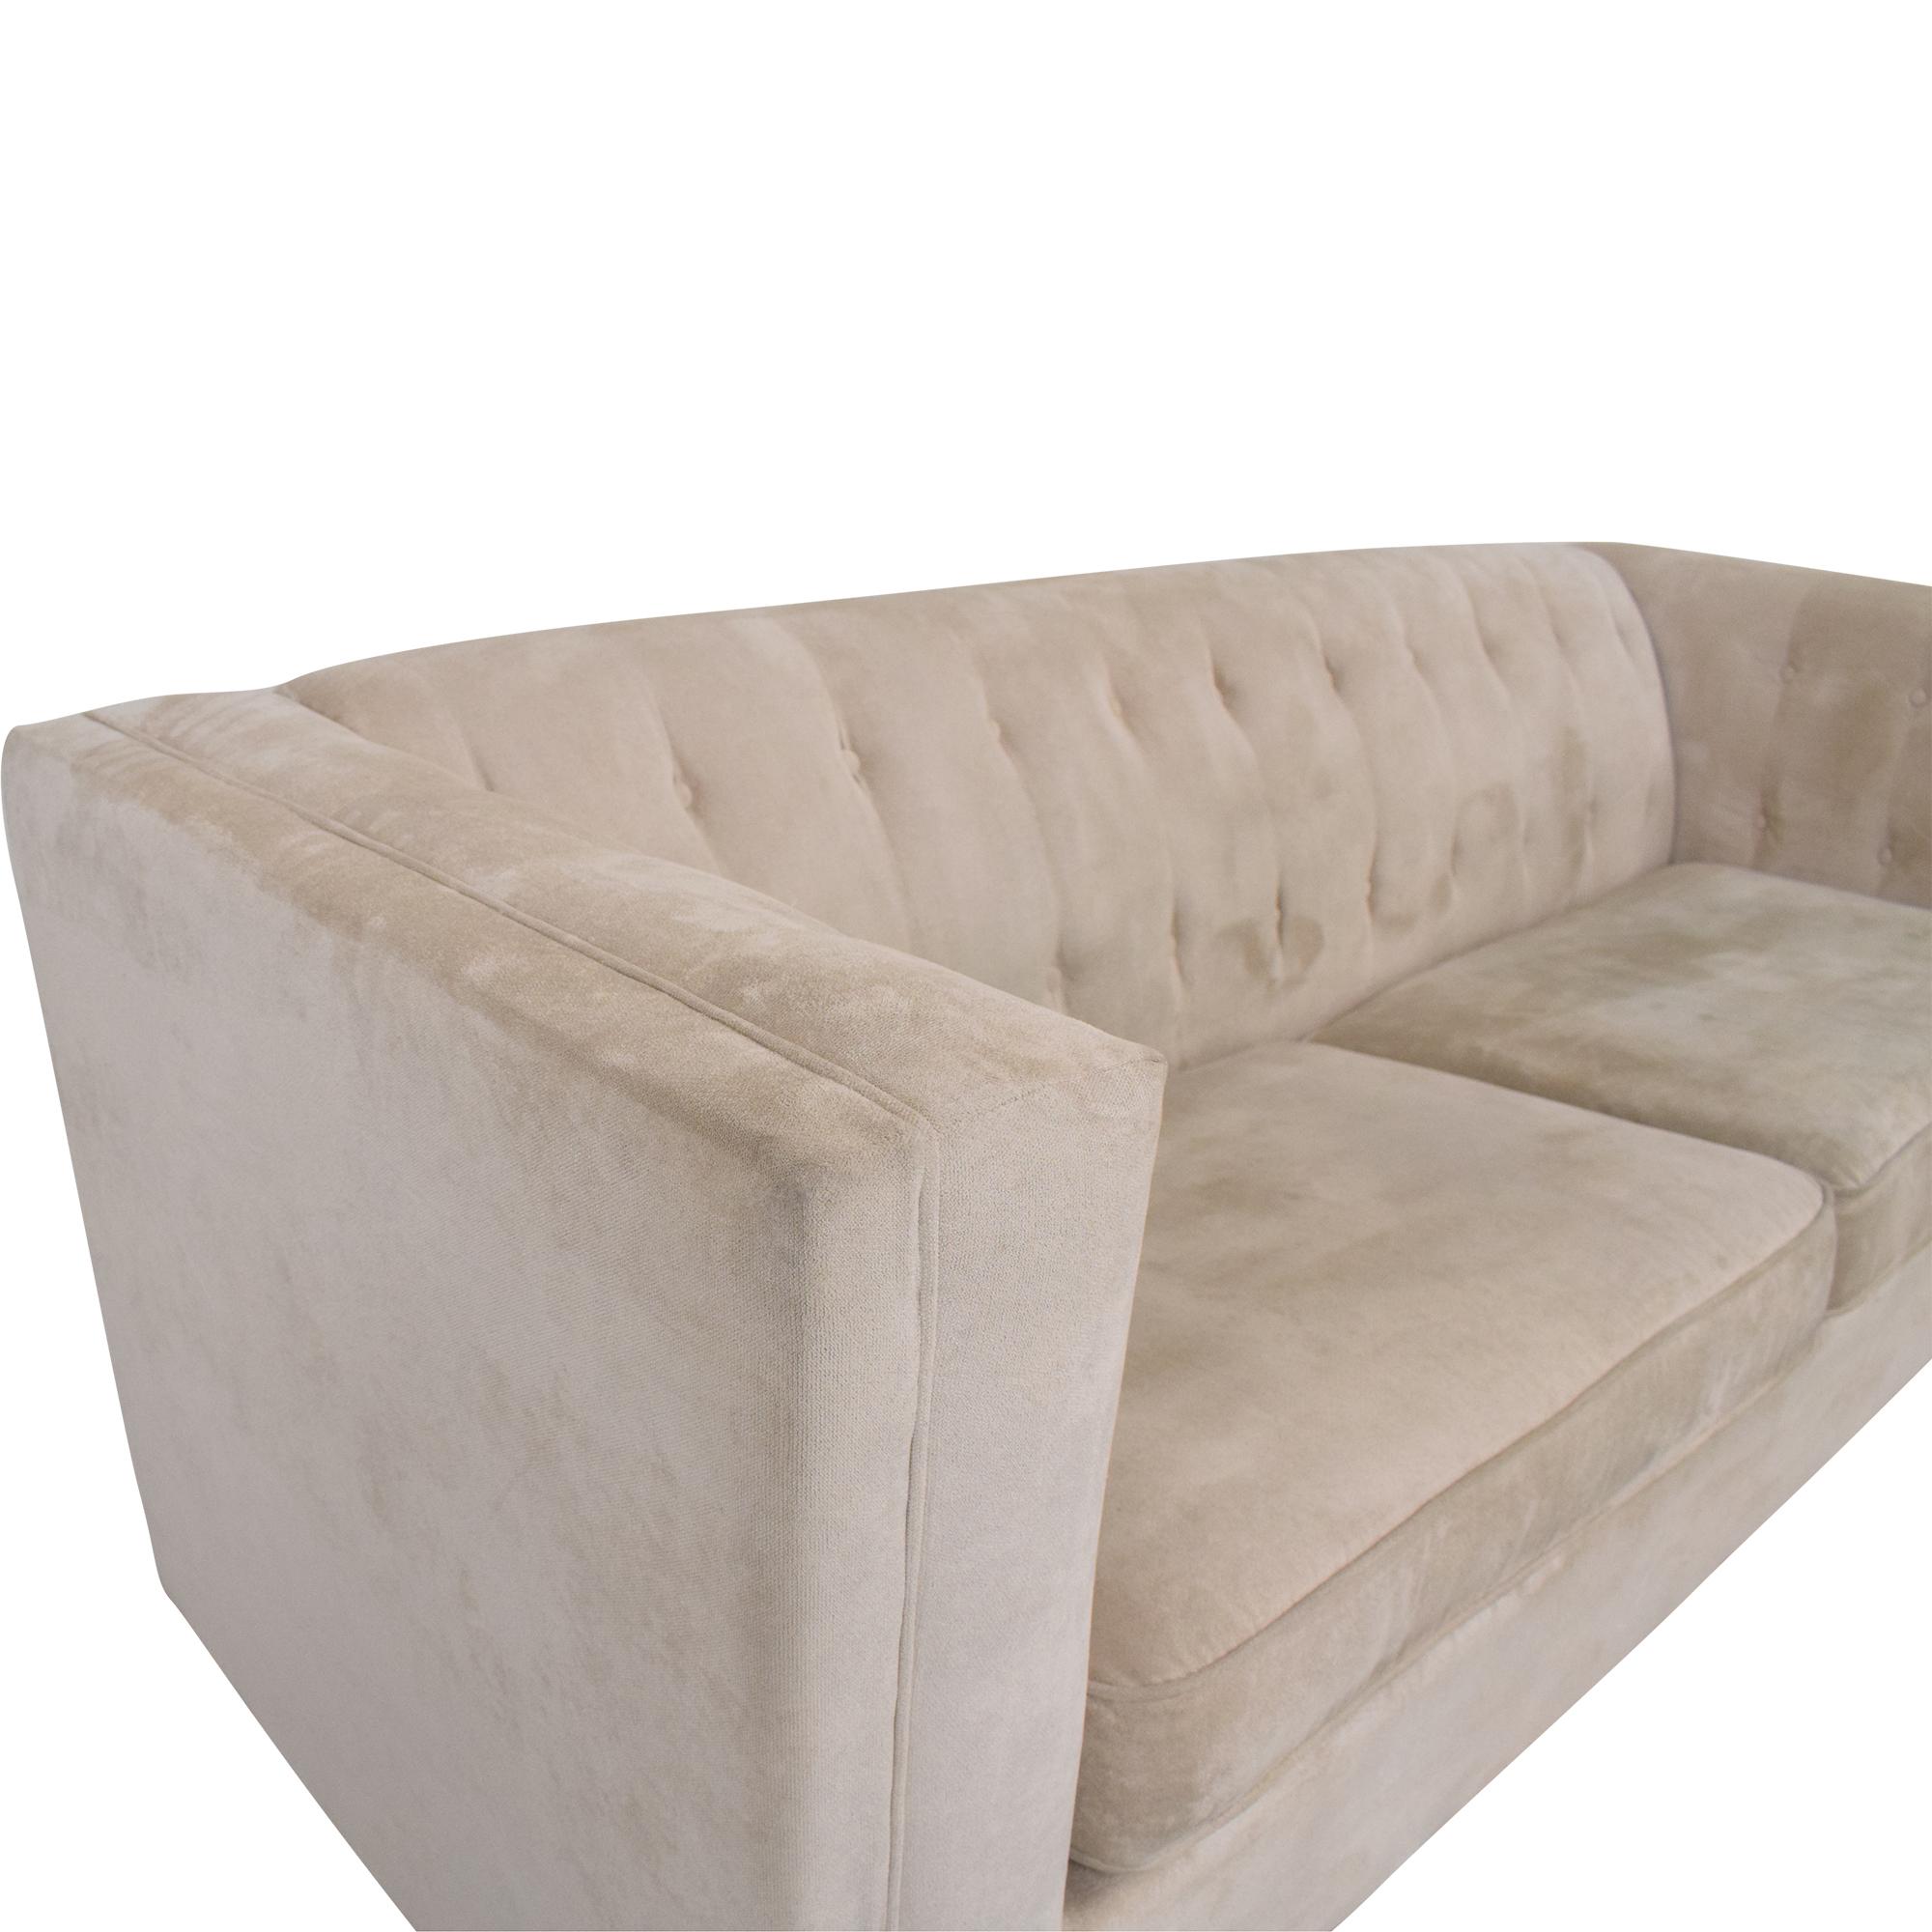 Coaster Fine Furniture Coaster Fine Furniture Alexis Tufted Sofa nyc